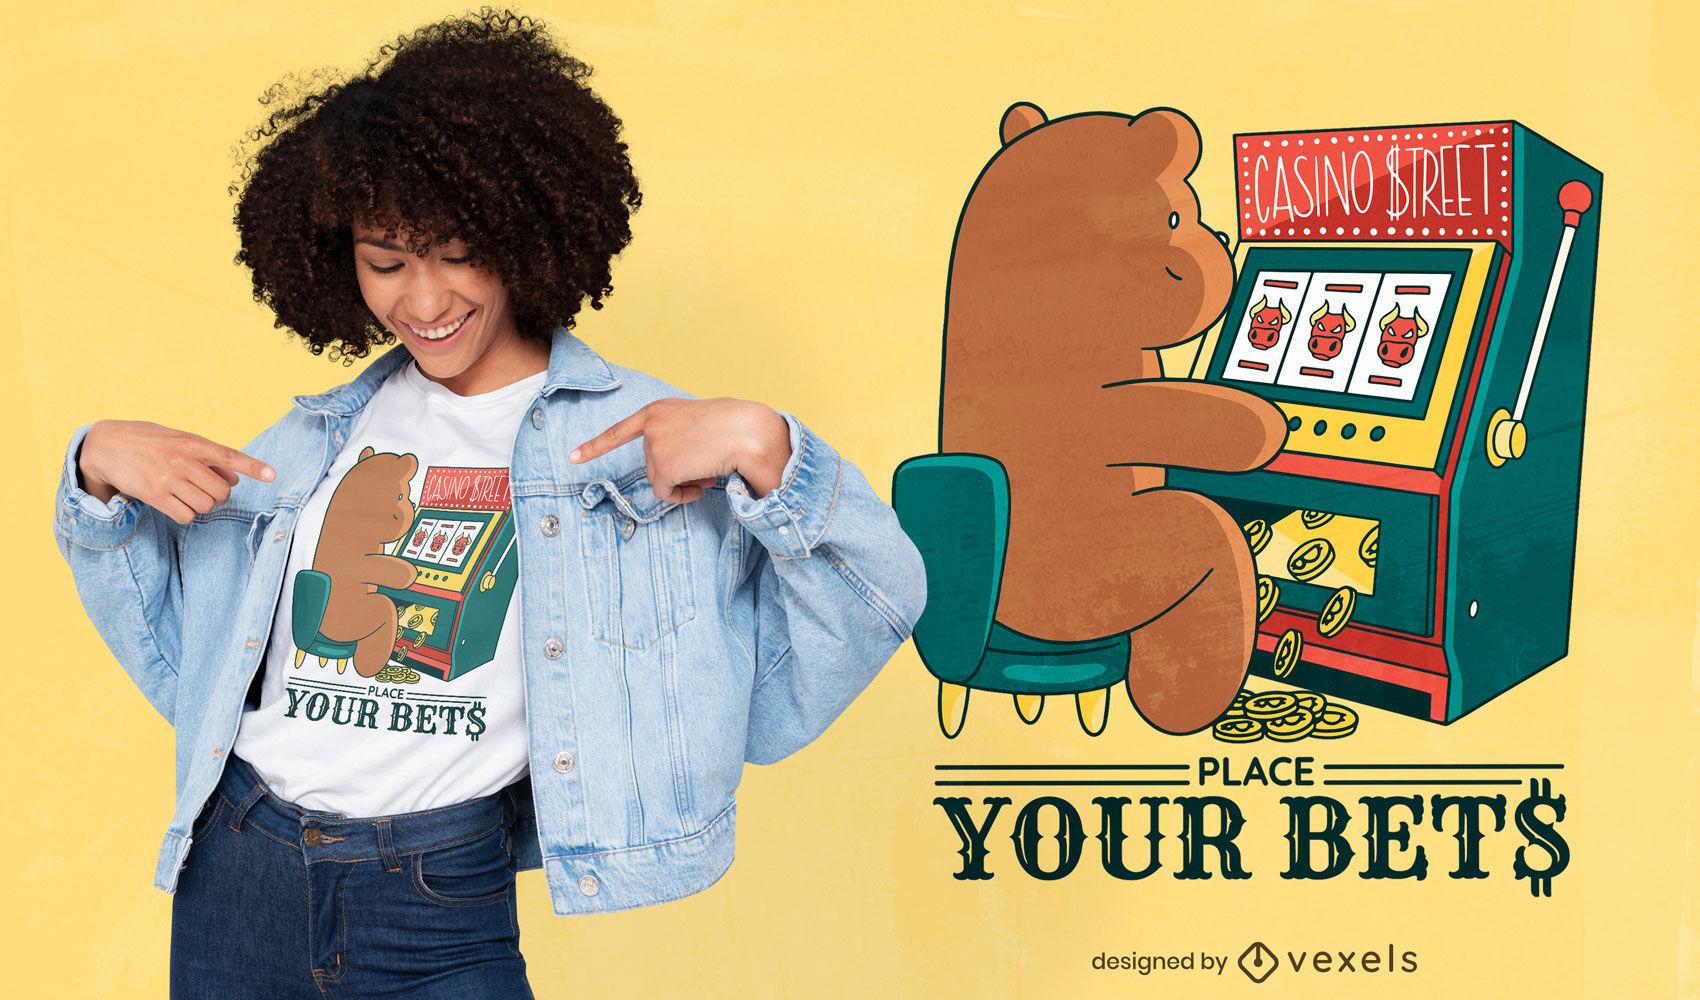 Finance casino slot bear t-shirt design